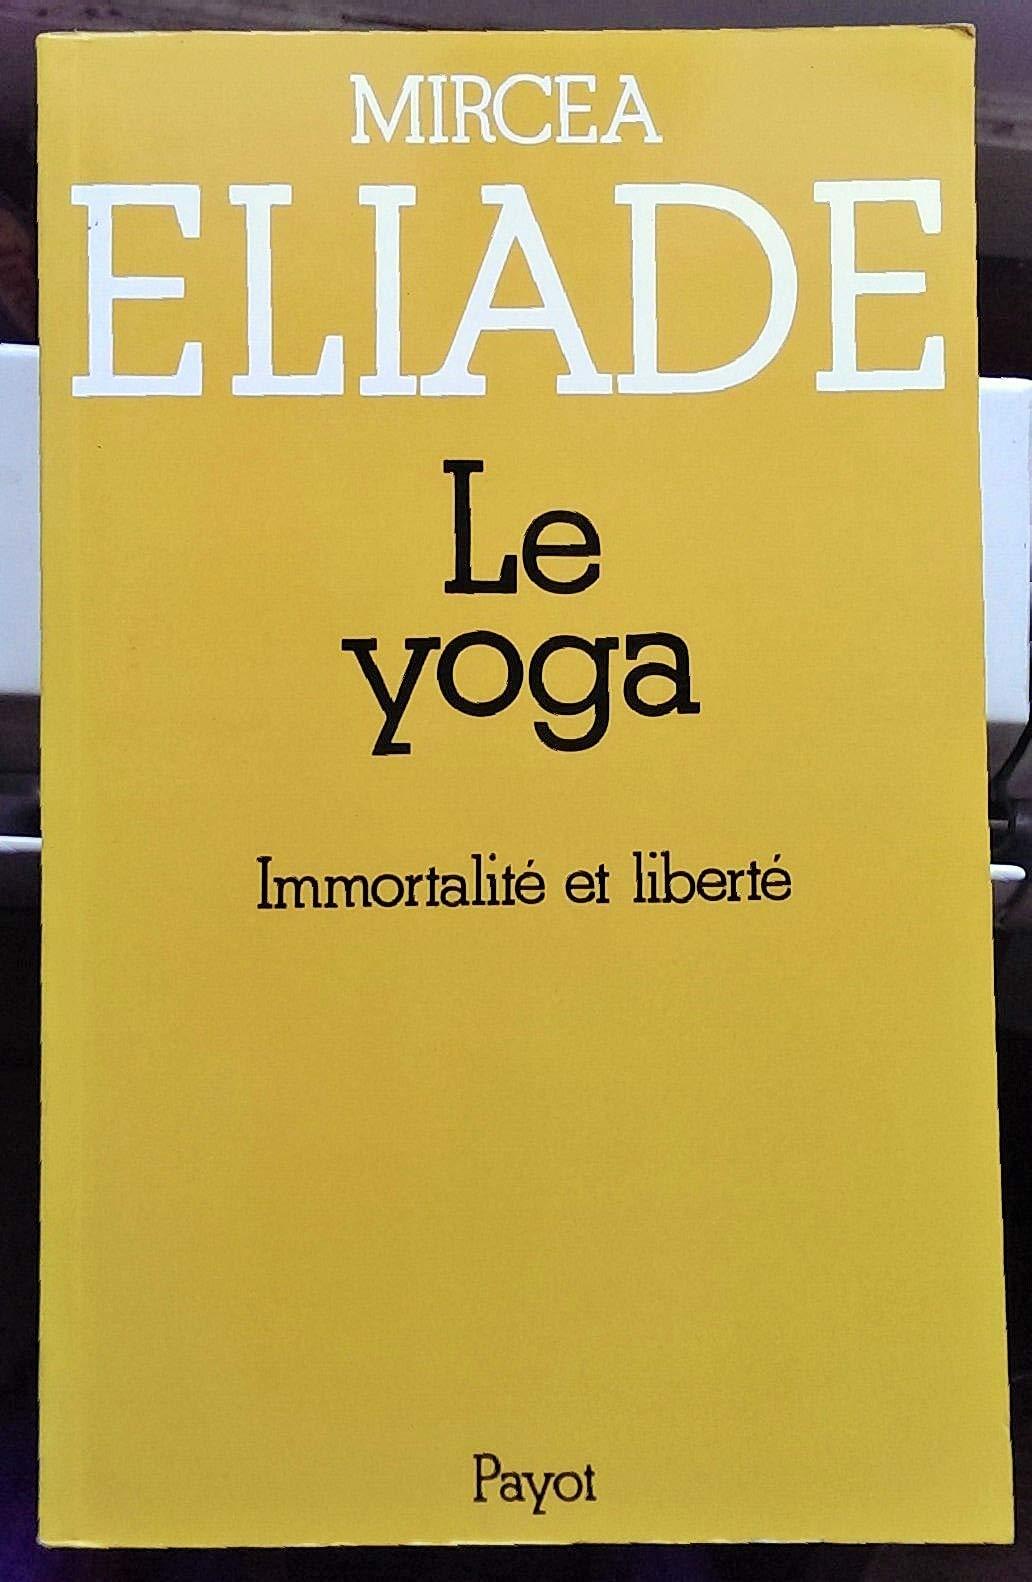 Le yoga Immortalité et liberté: Eliade Mircea: 9782228133609 ...